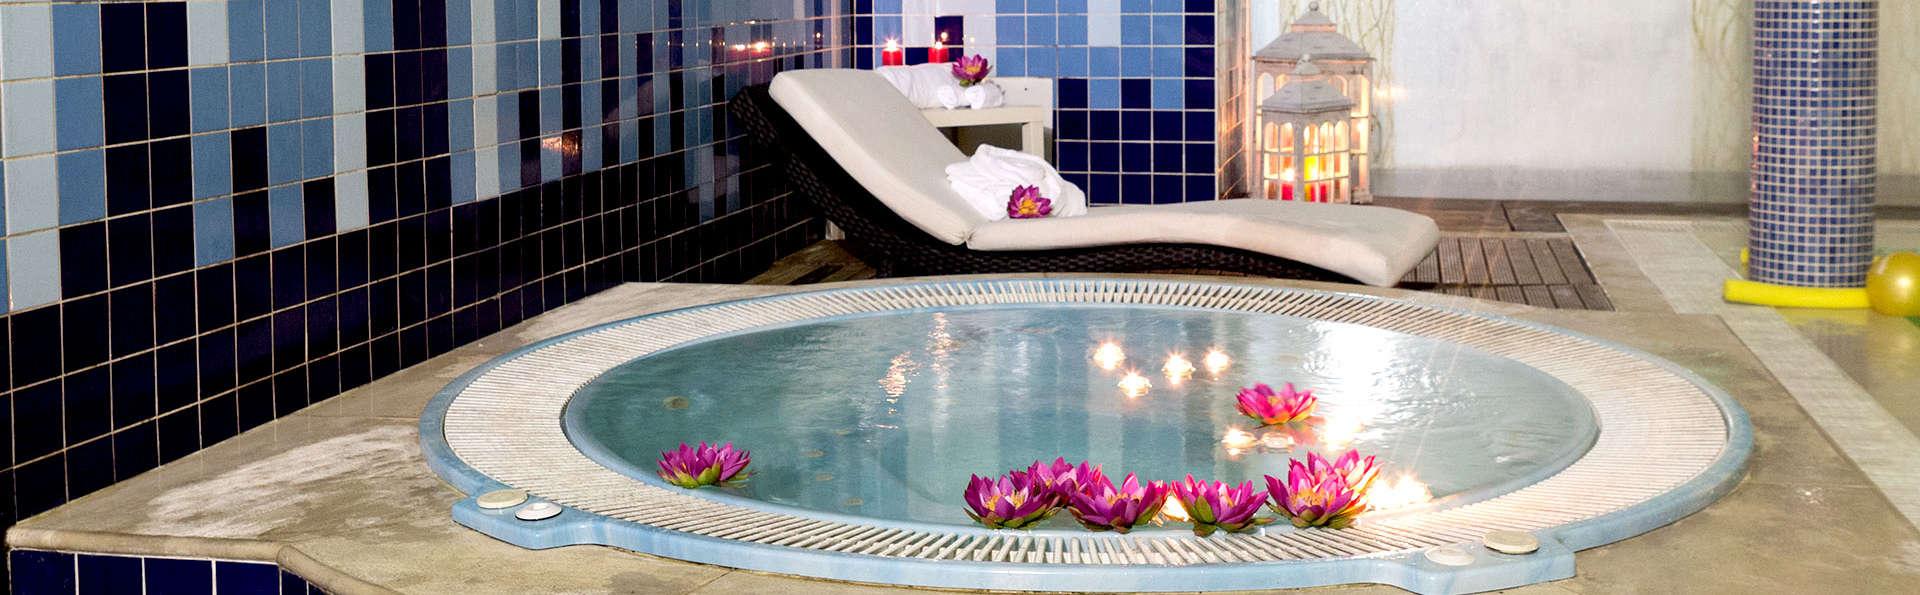 Massage en spa in 4-sterrenhotel bij de Portugese kust